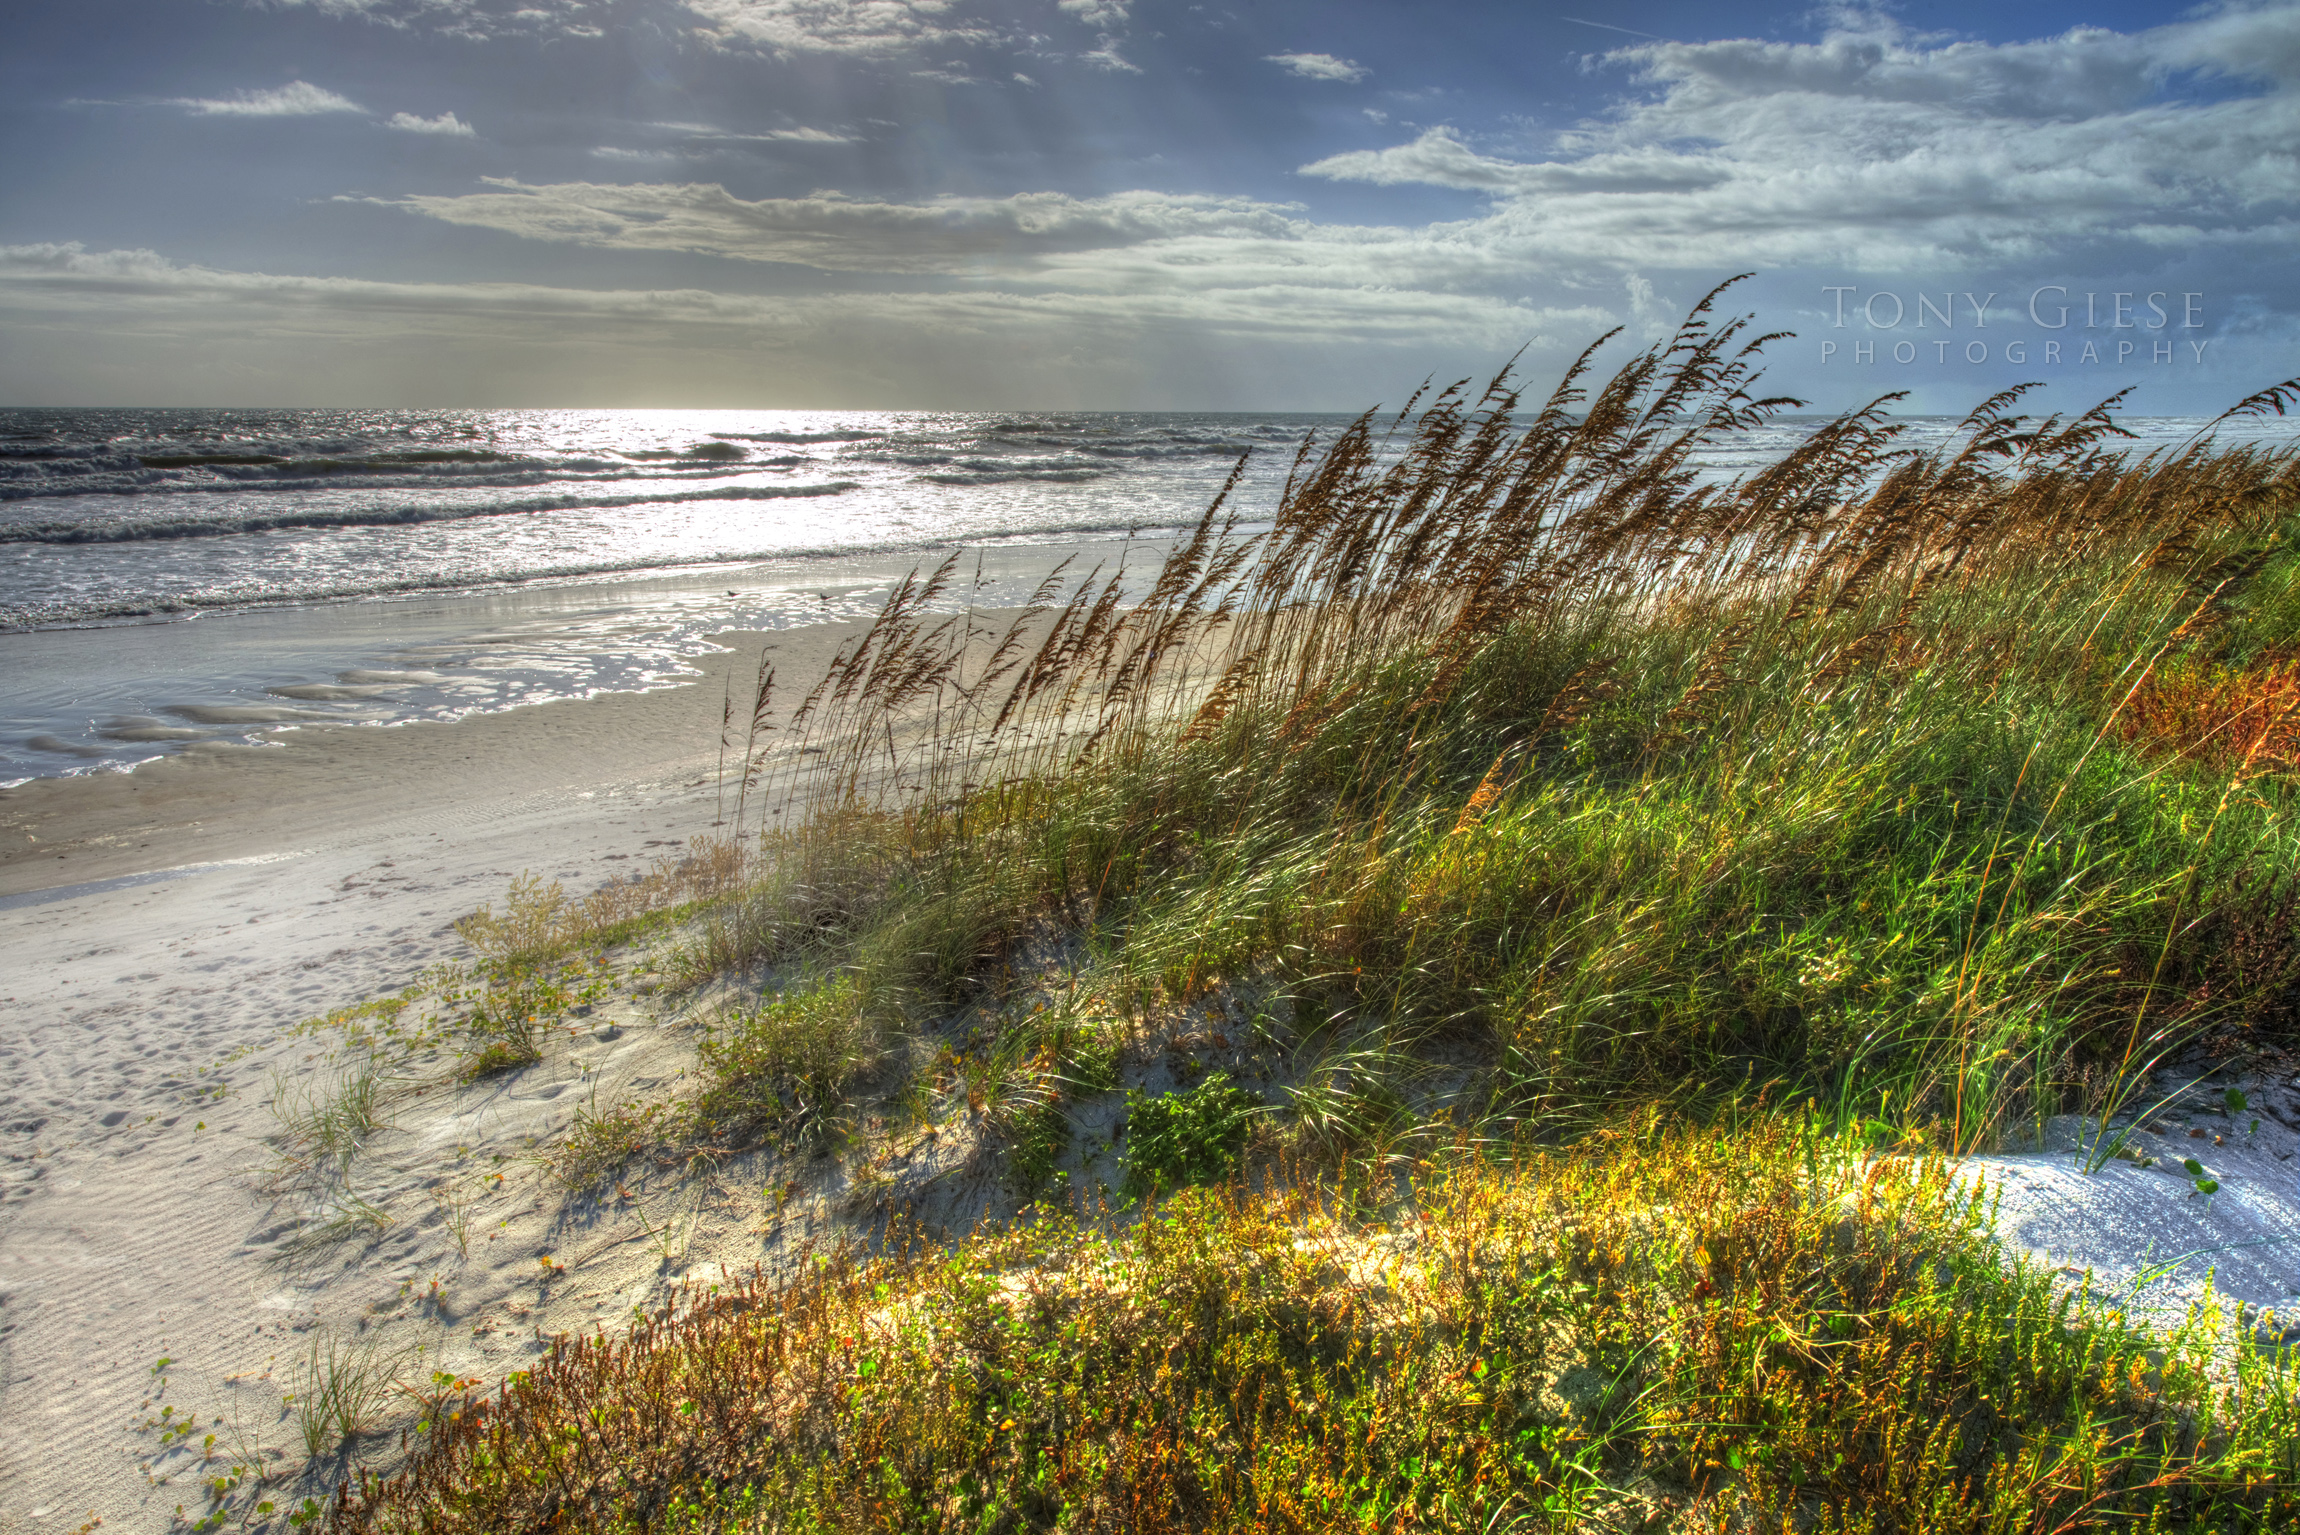 Sea Oats Daytona Beach Dsc 0671 Lr